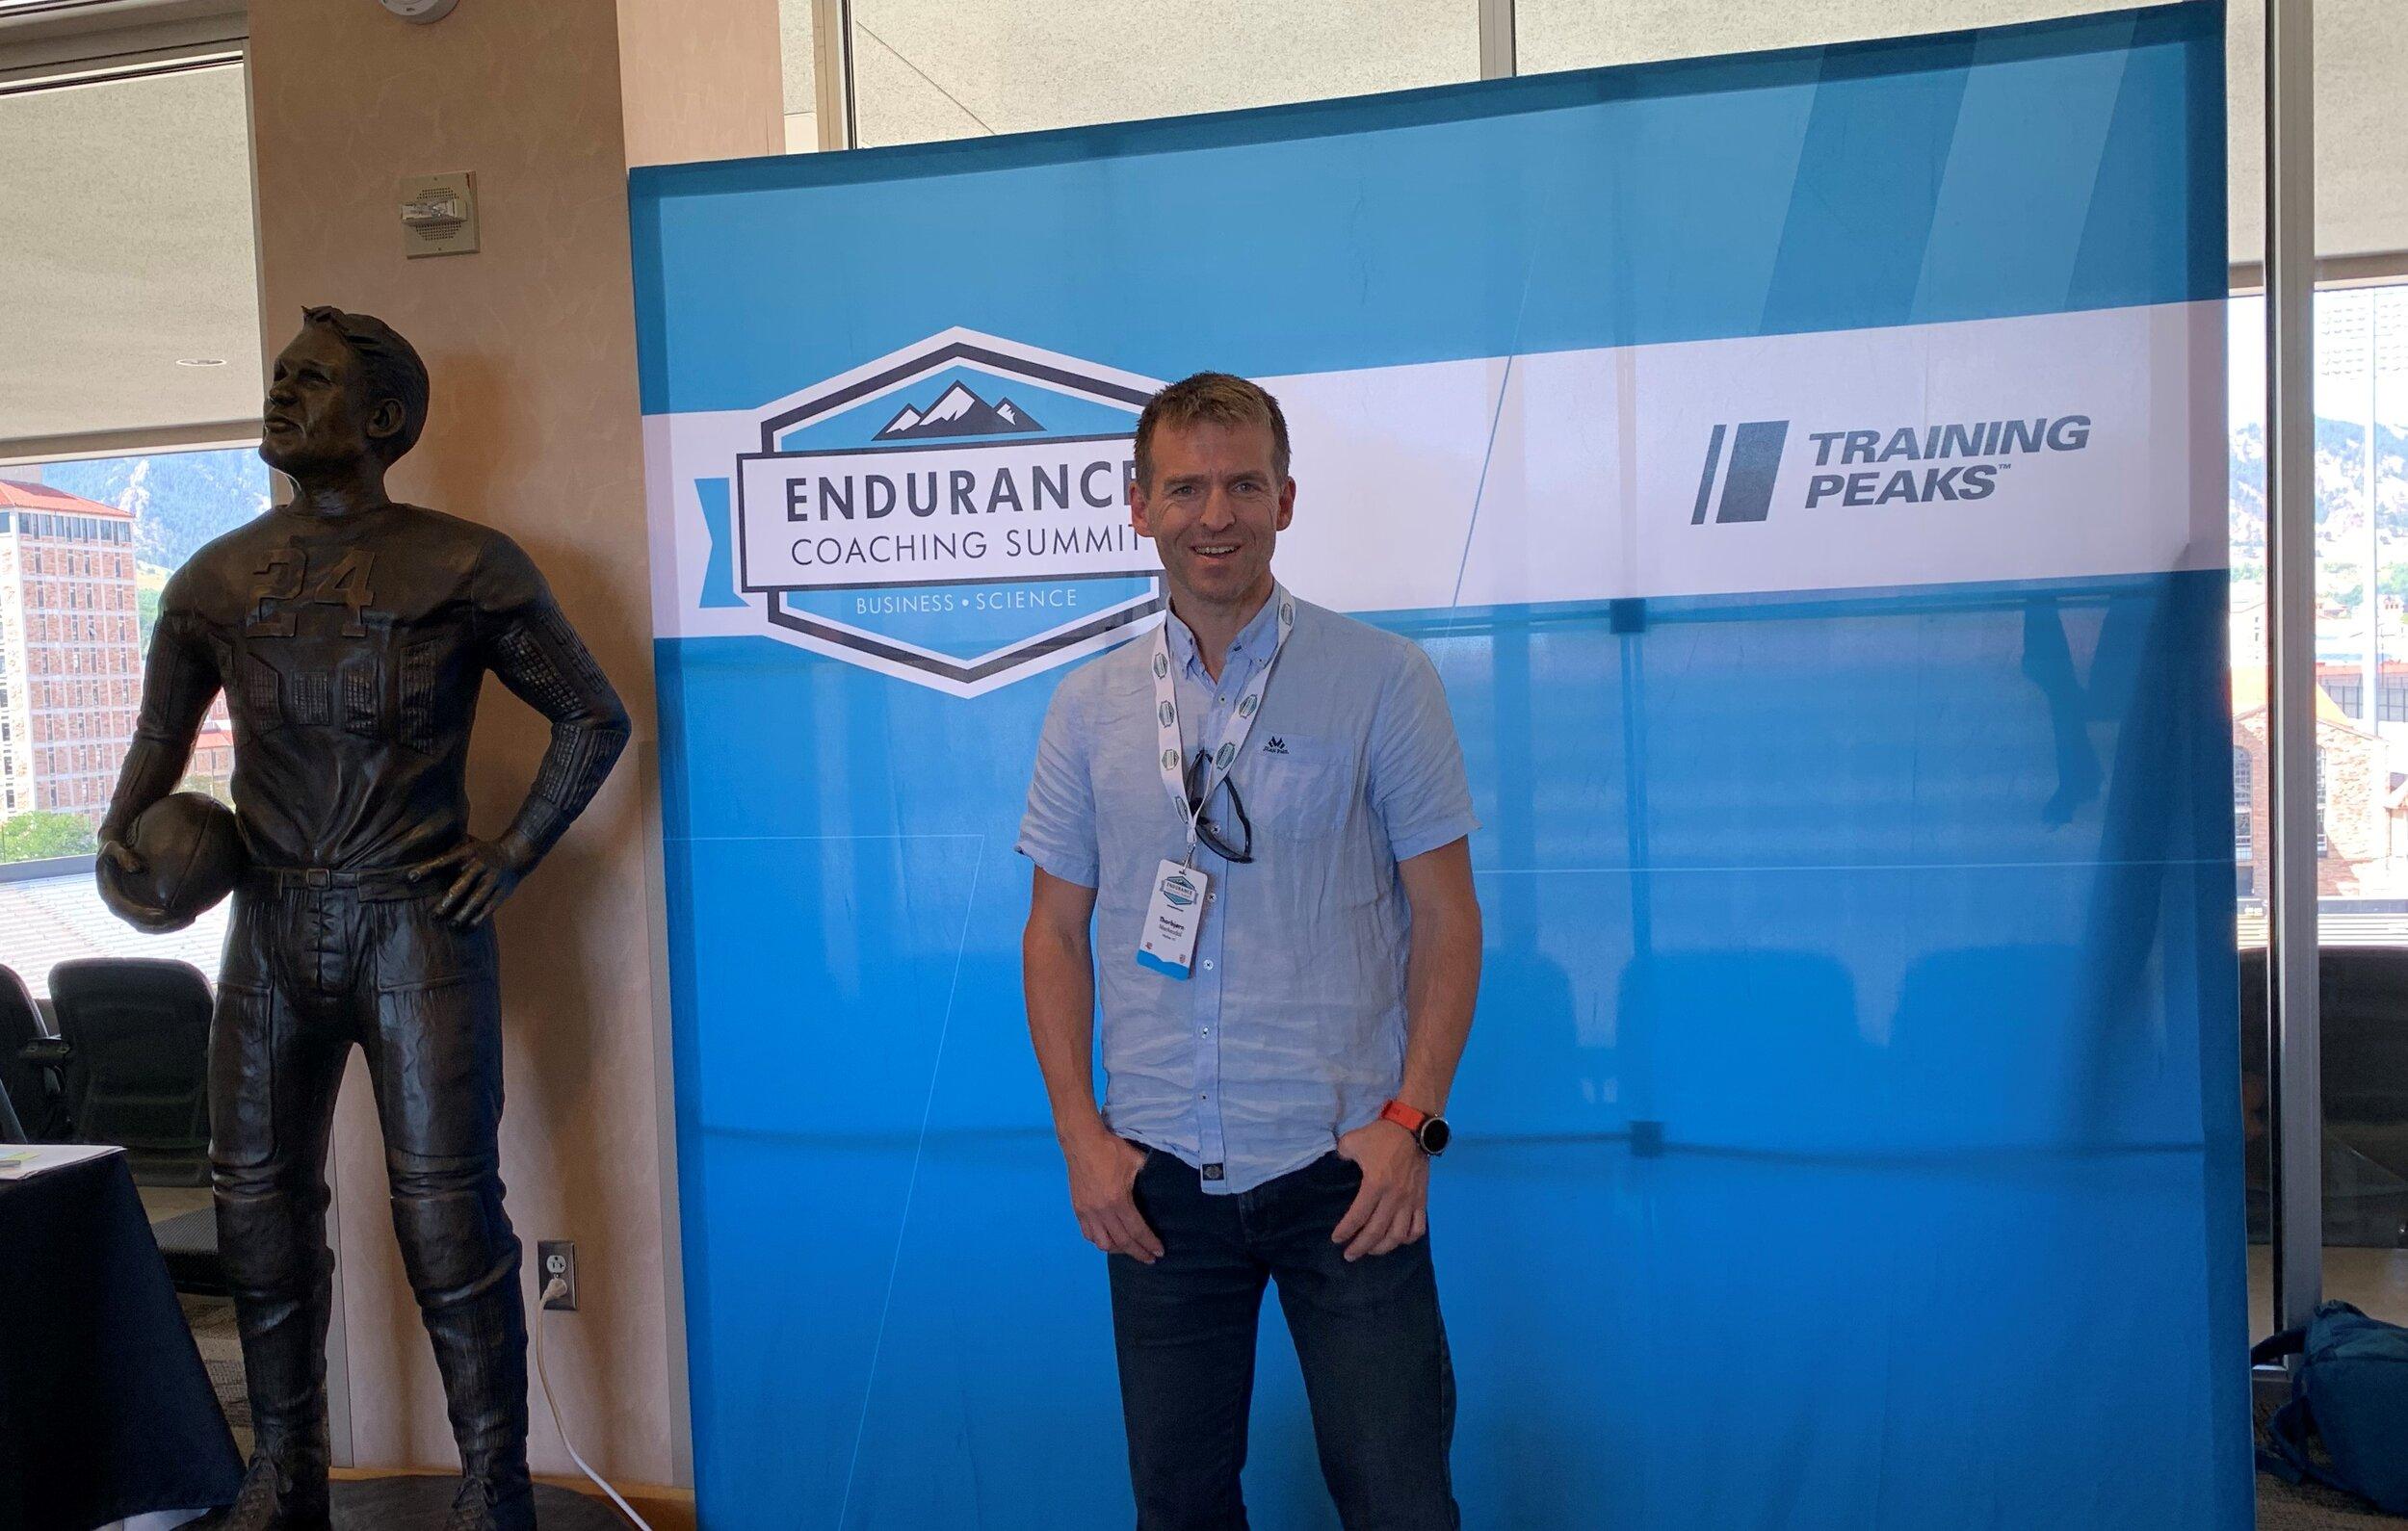 Boulder_Trainingpeaks.jpg